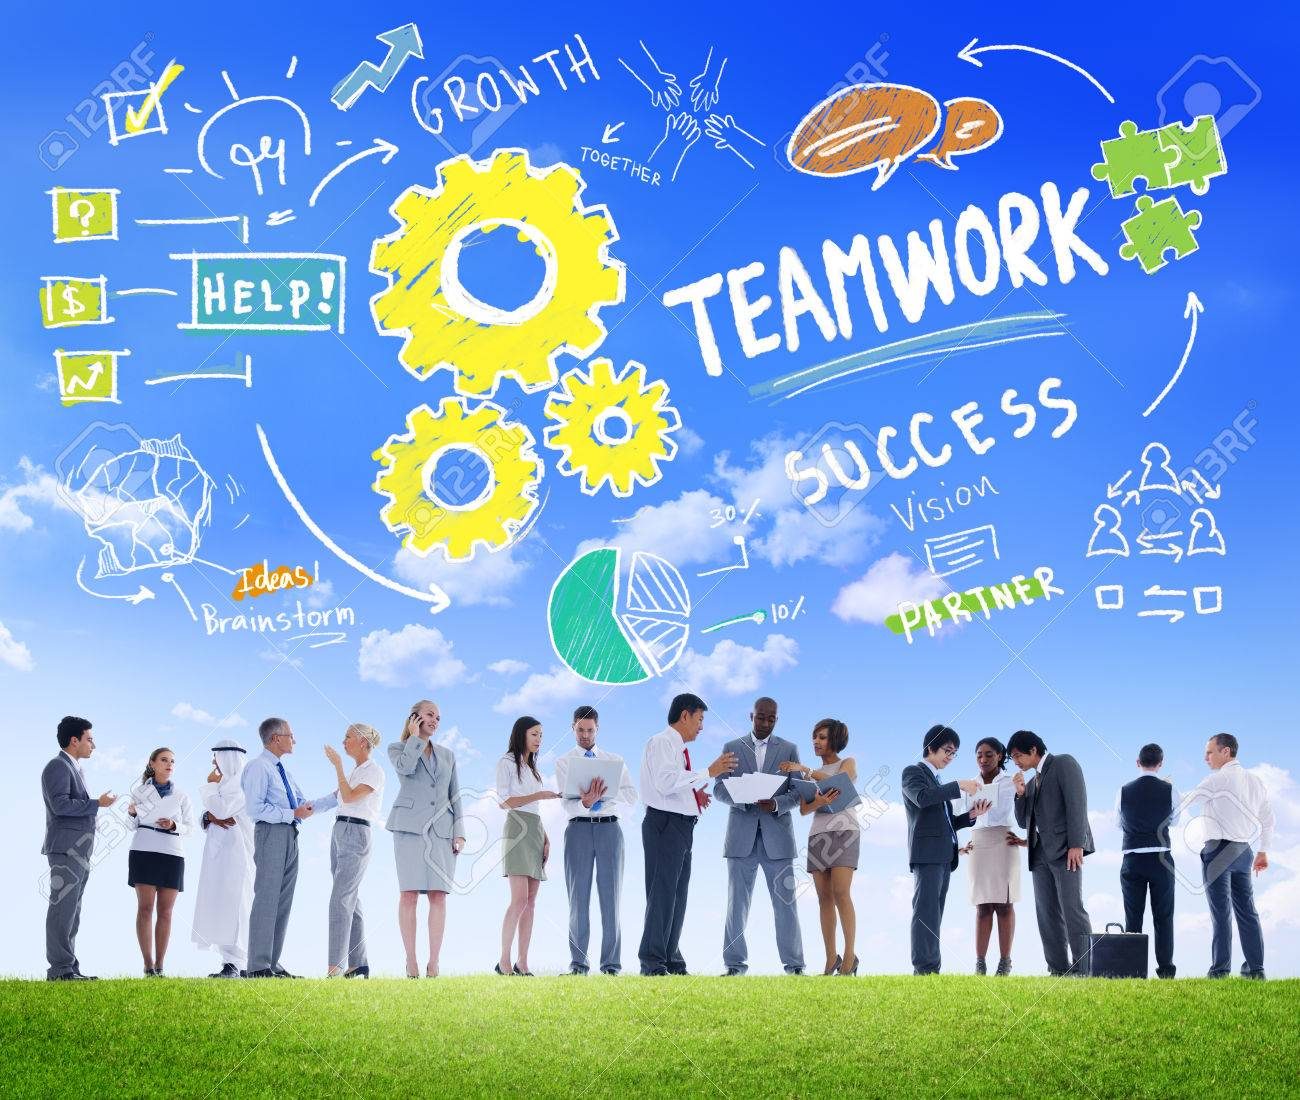 Teamwork Team Together Collaboration Business People Communication Concept - 39109408